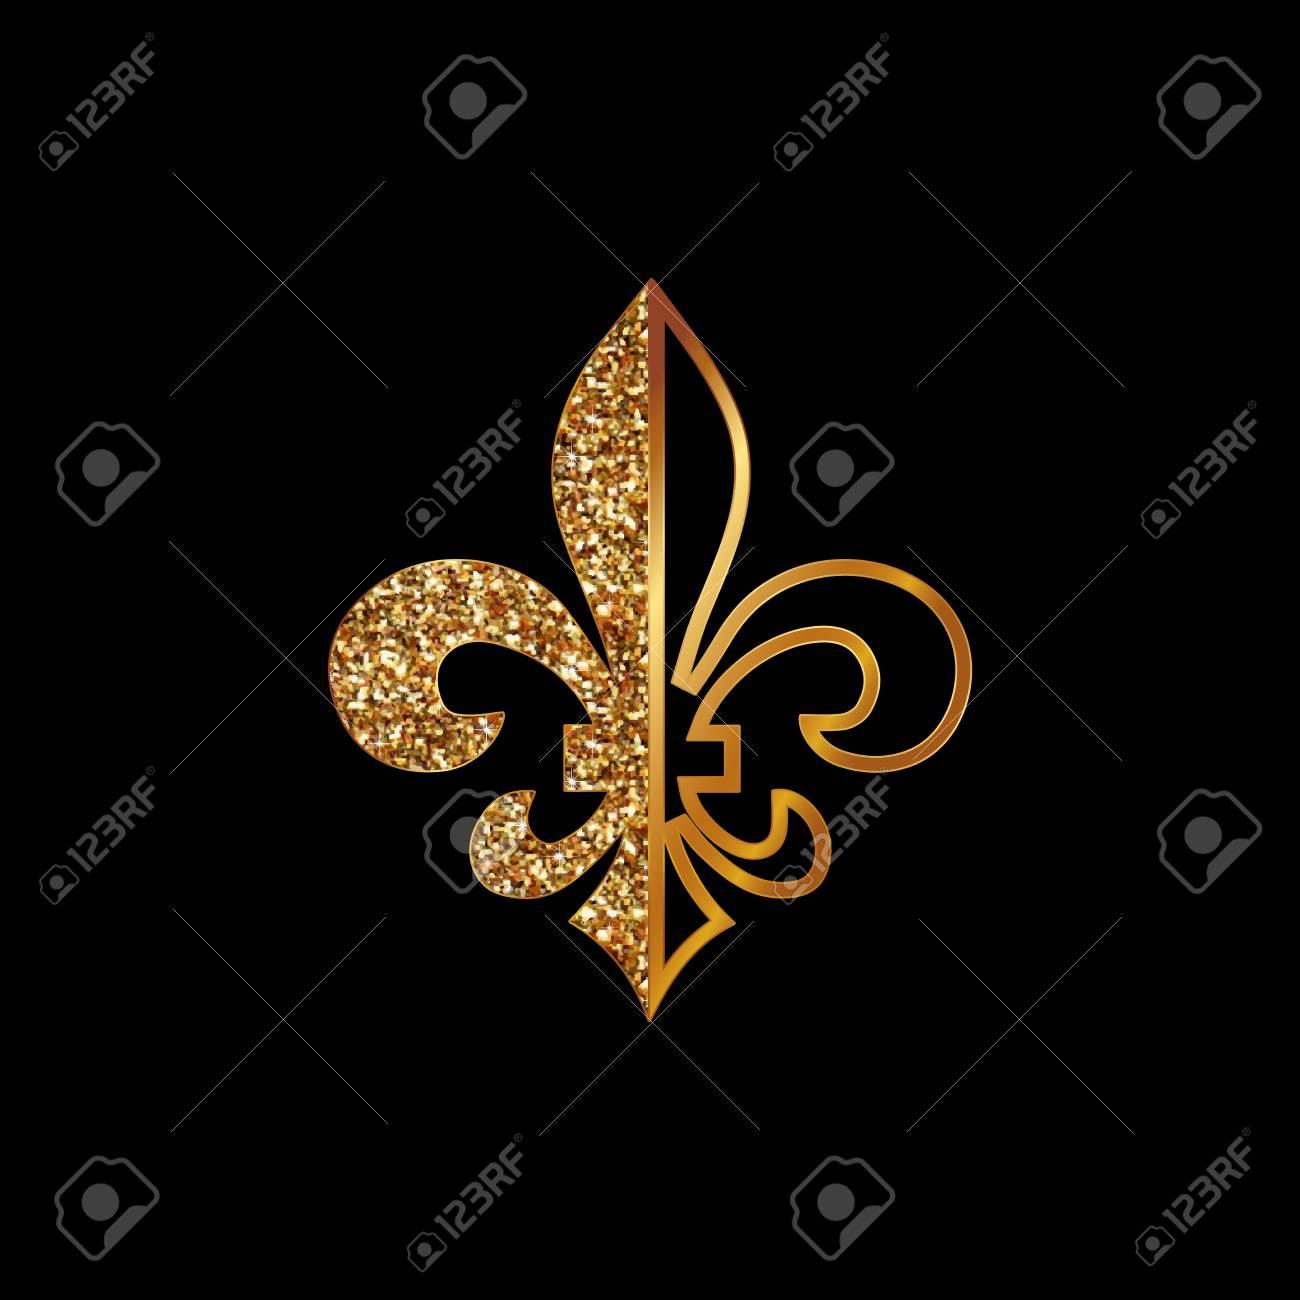 Fleur De Lis Symbols Golden Glittering Silhouettes Heraldic